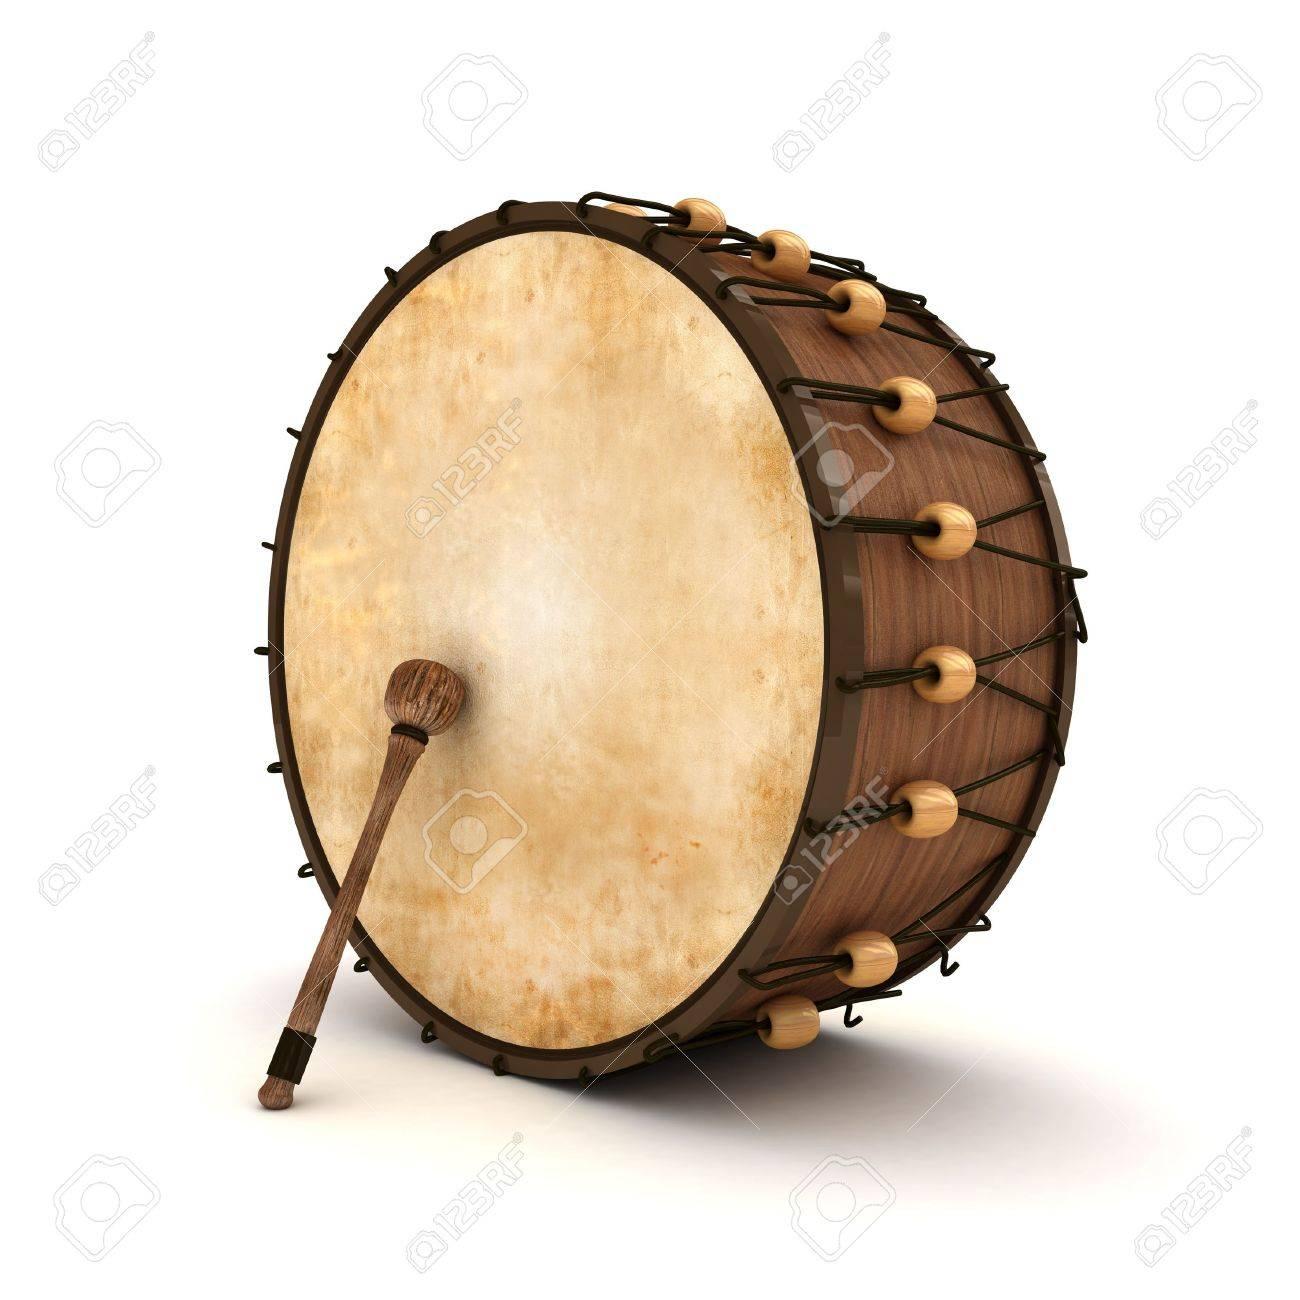 Ramadan drum 3D Rendered Isolated Stock Photo - 11446968